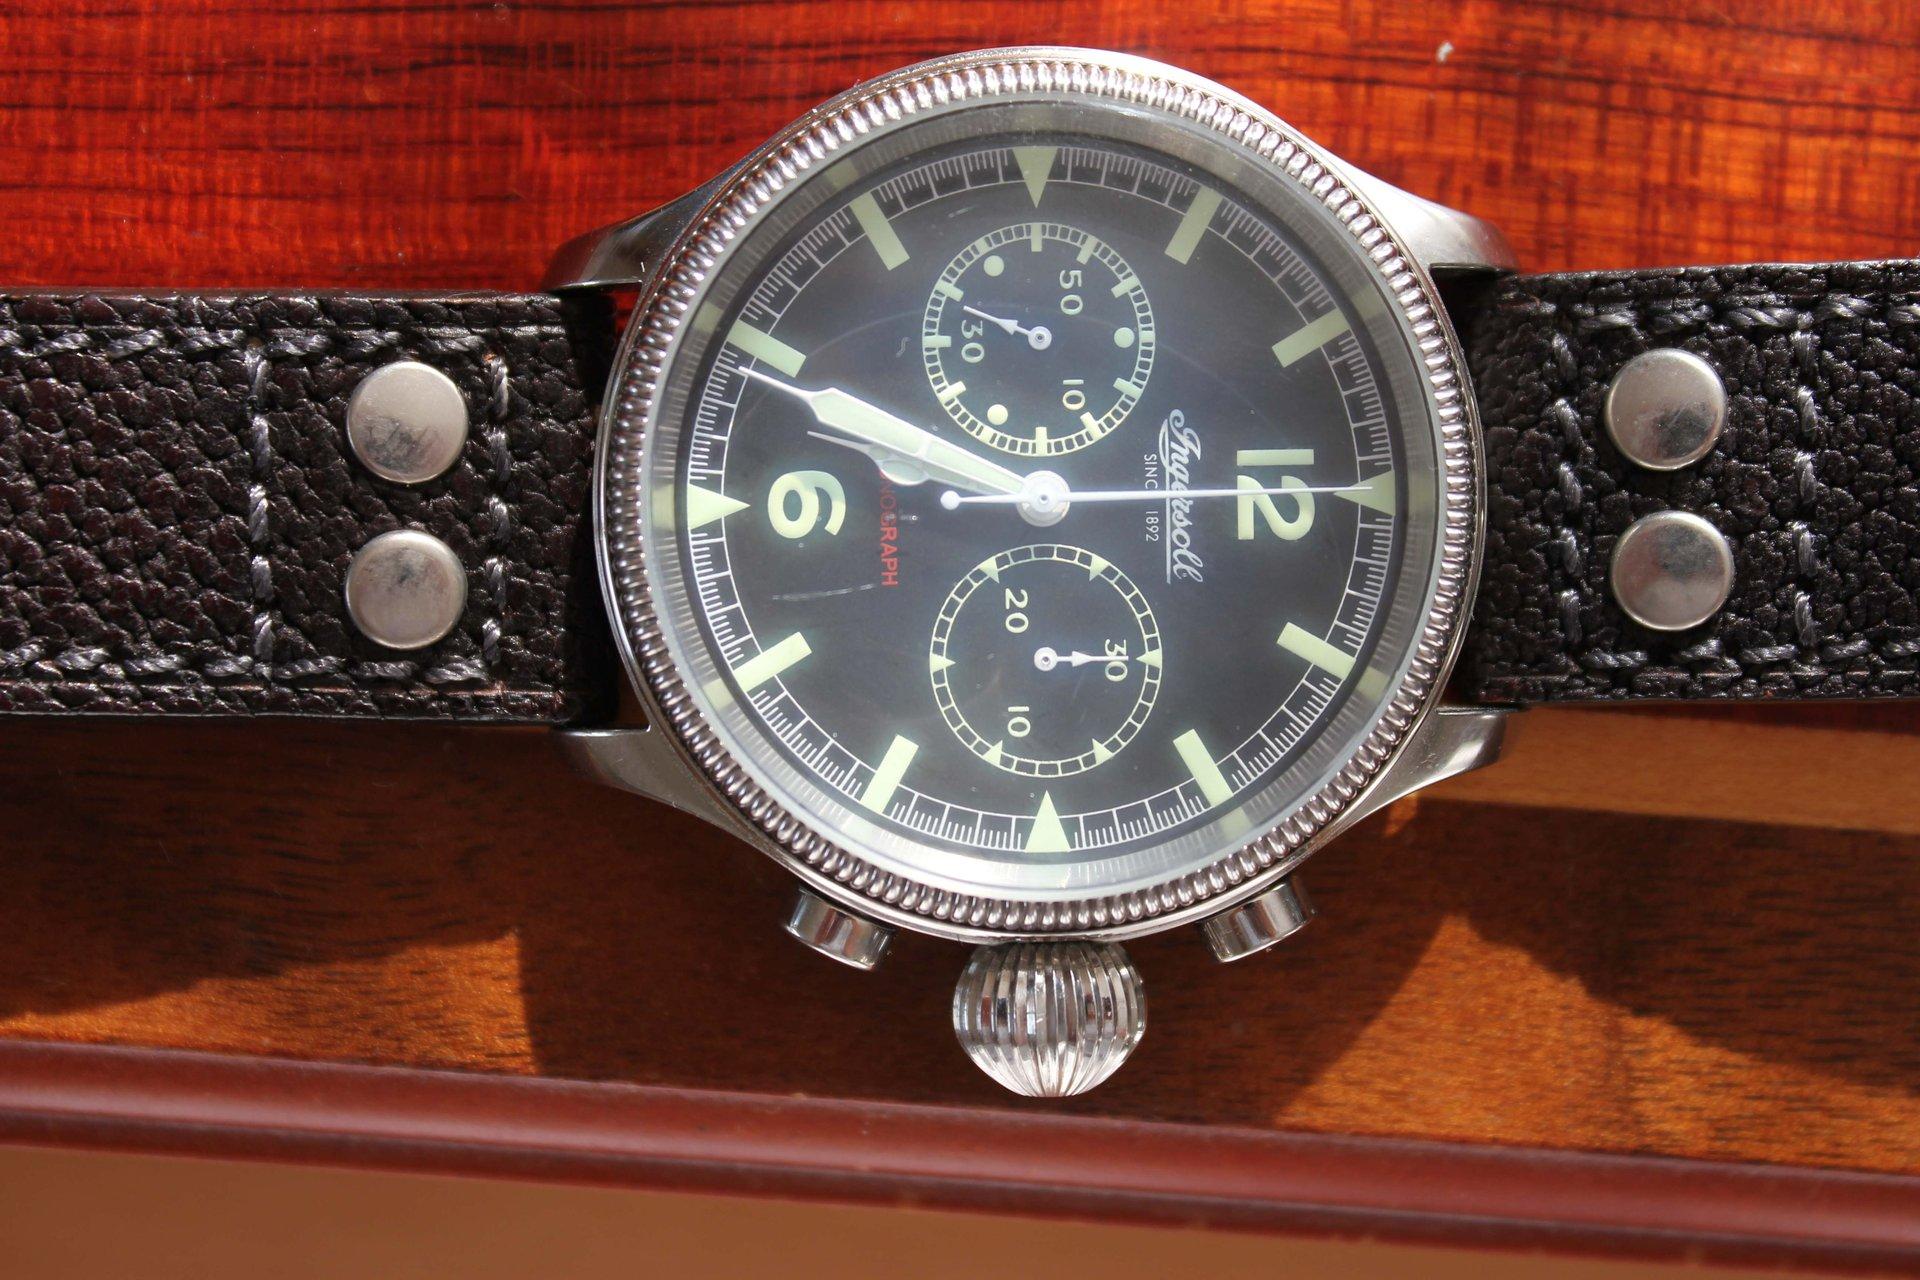 Erledigt] Ingersoll Wells Fargo Chronograph - UhrForum